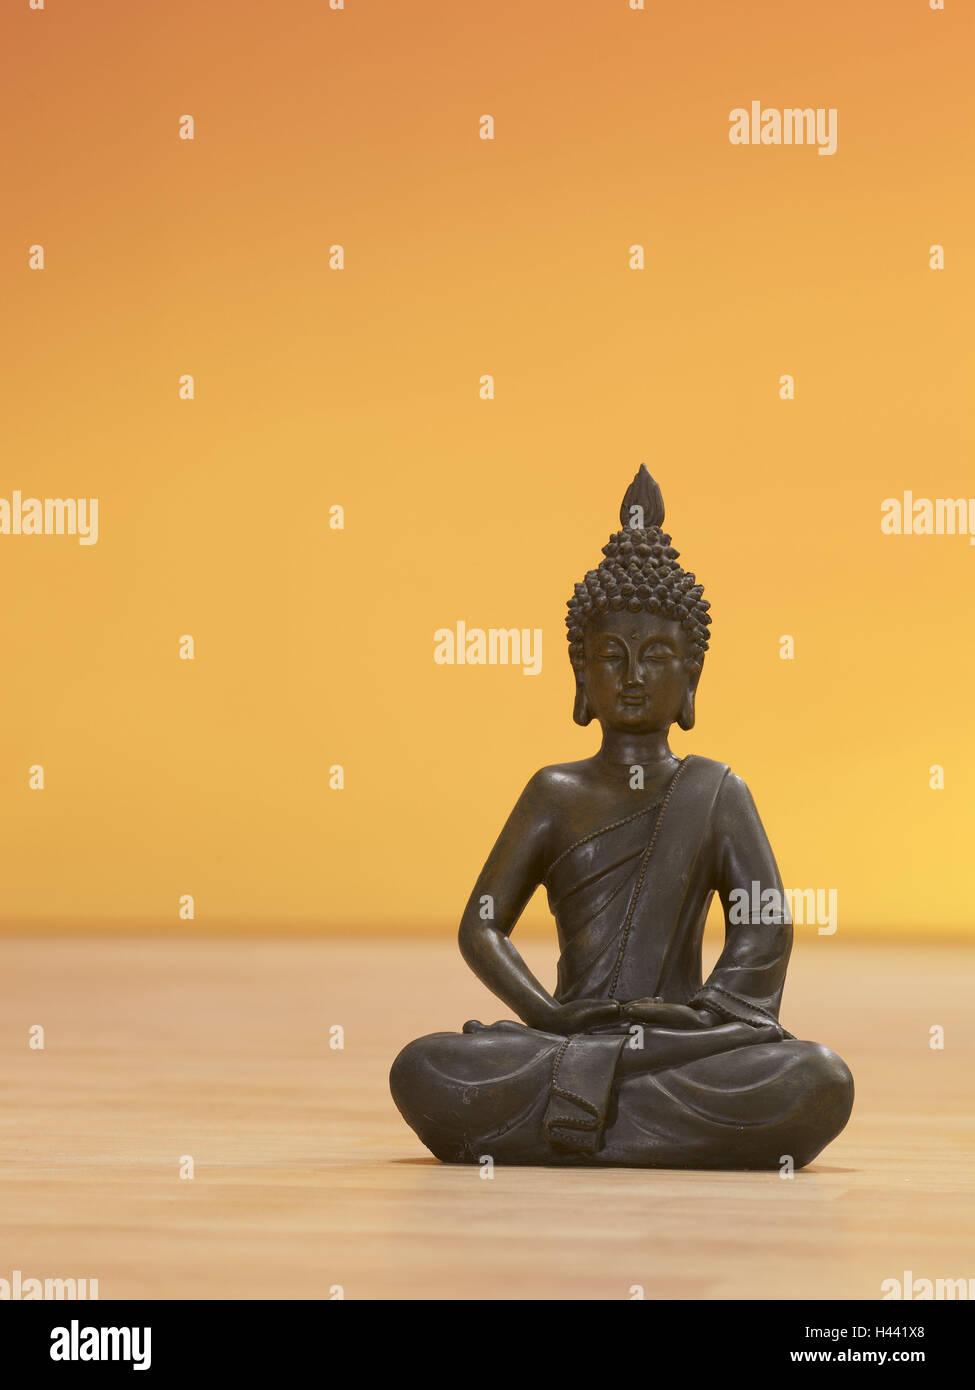 Indian Buddha's figure, lotus flowernsitz, figure, Buddha, Buddha's figure, Buddhism, meditation, concentration, - Stock Image